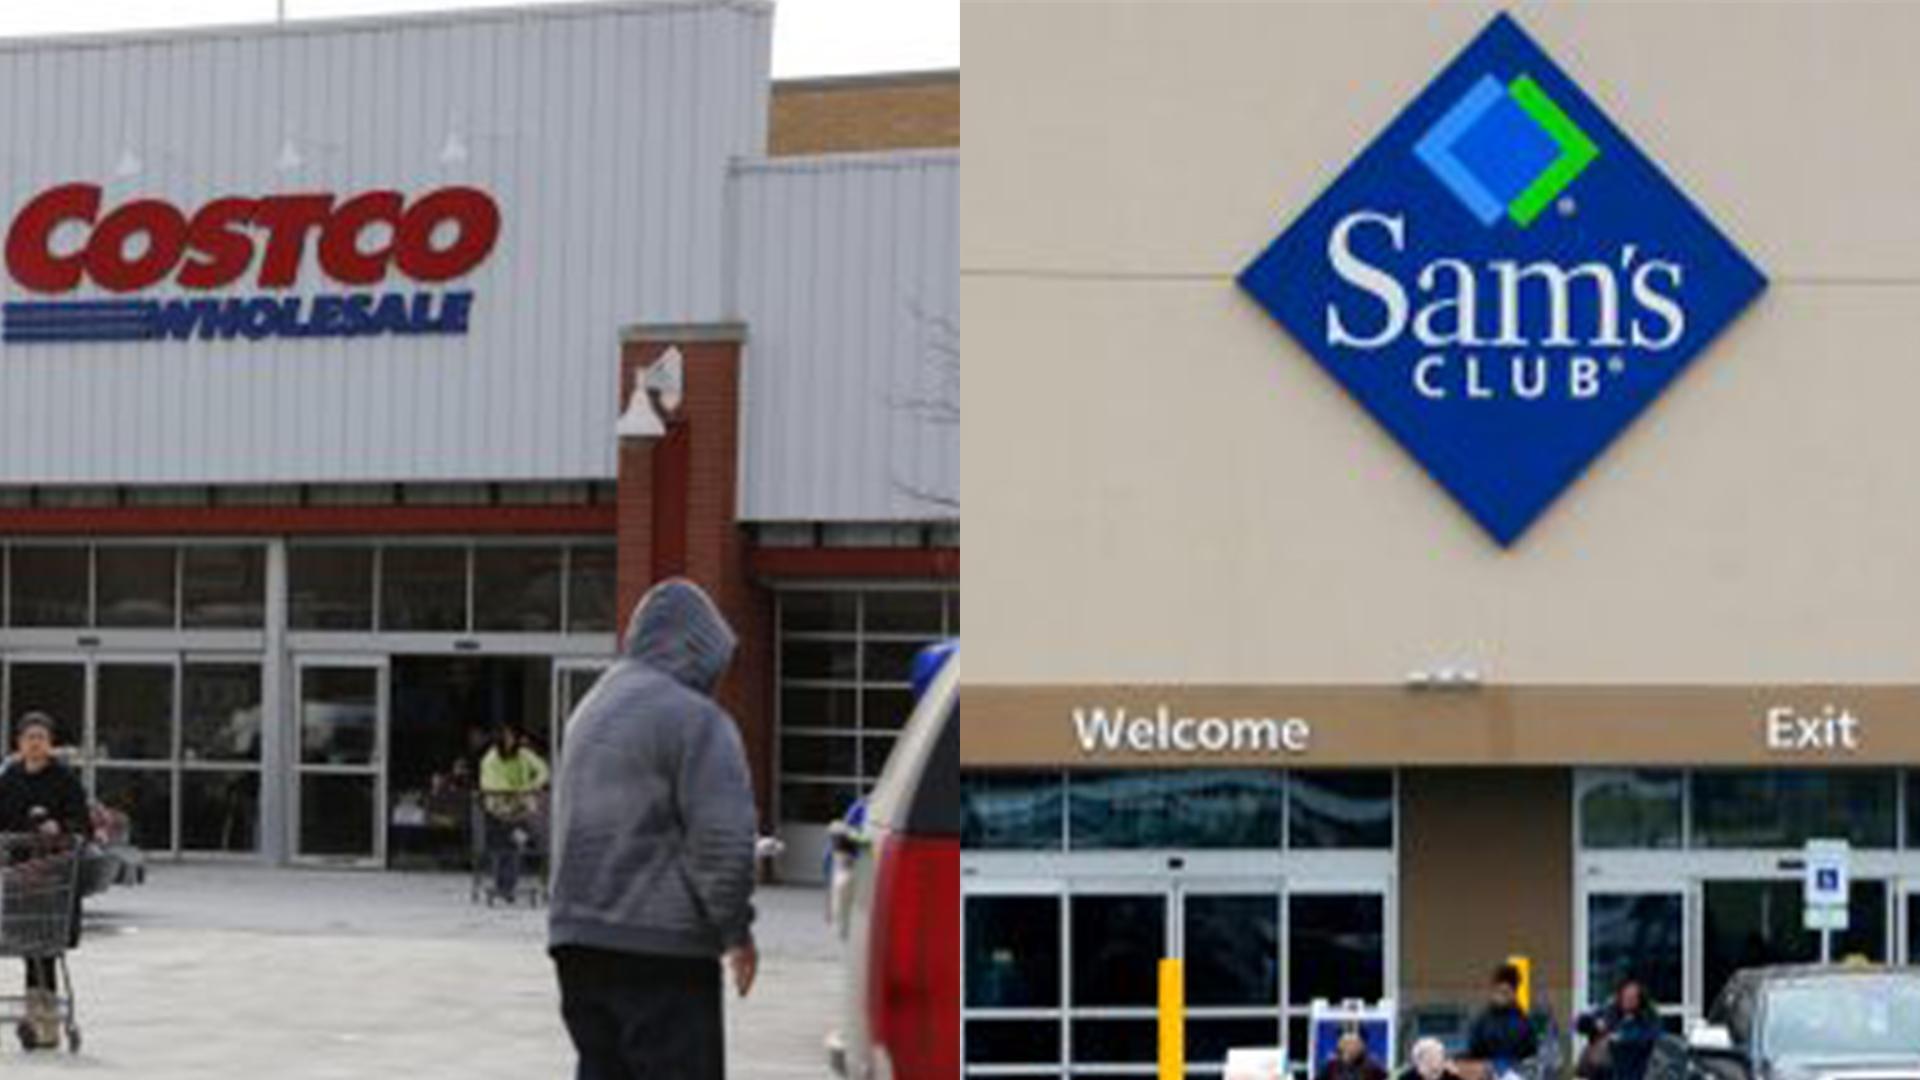 Costco Sam S Club Make Changes Amid Covid 19 Outbreak Wdtn Com